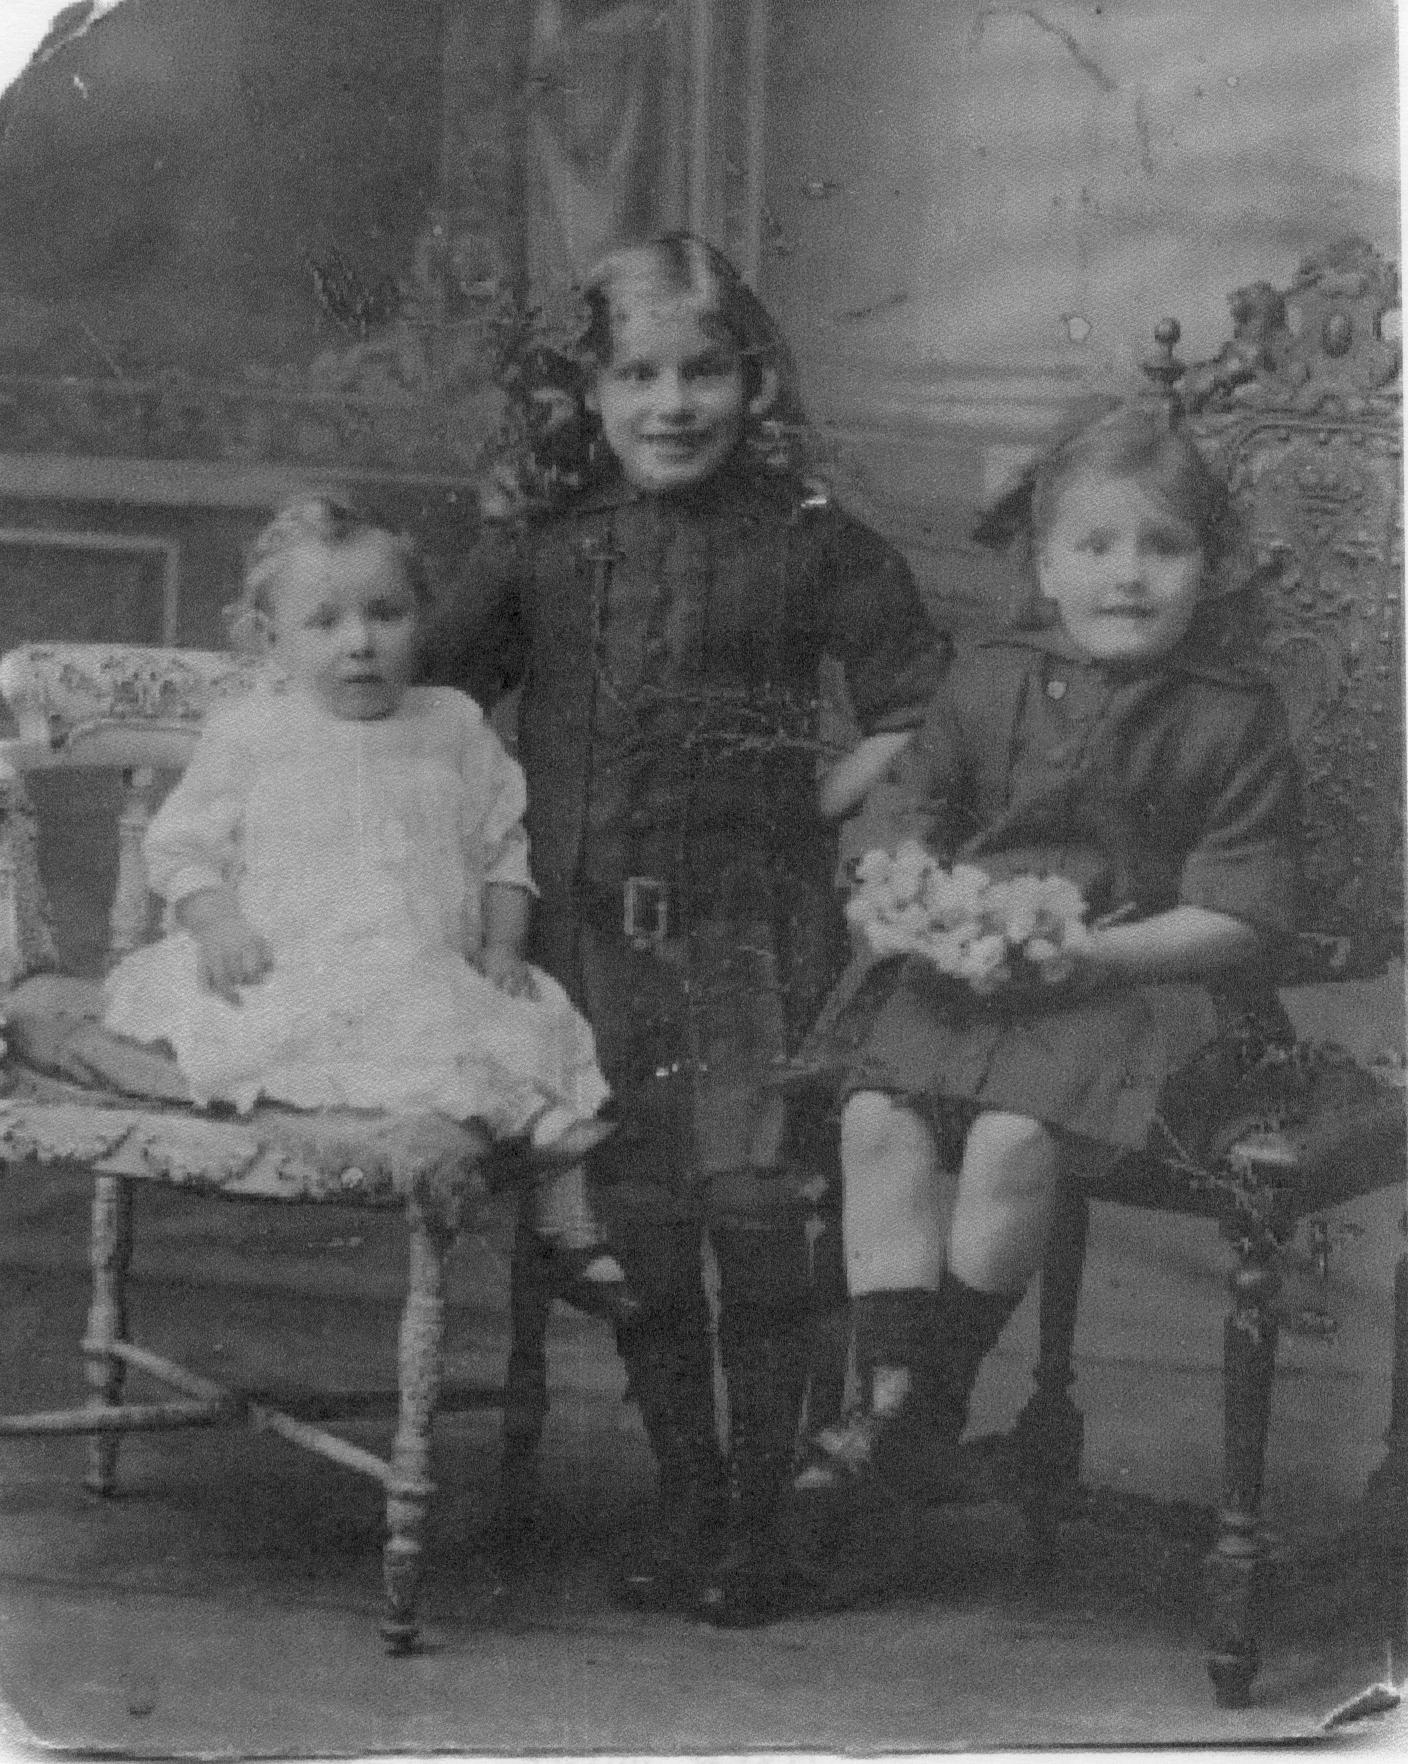 Studio Portrait Three Young Sisters c.1915